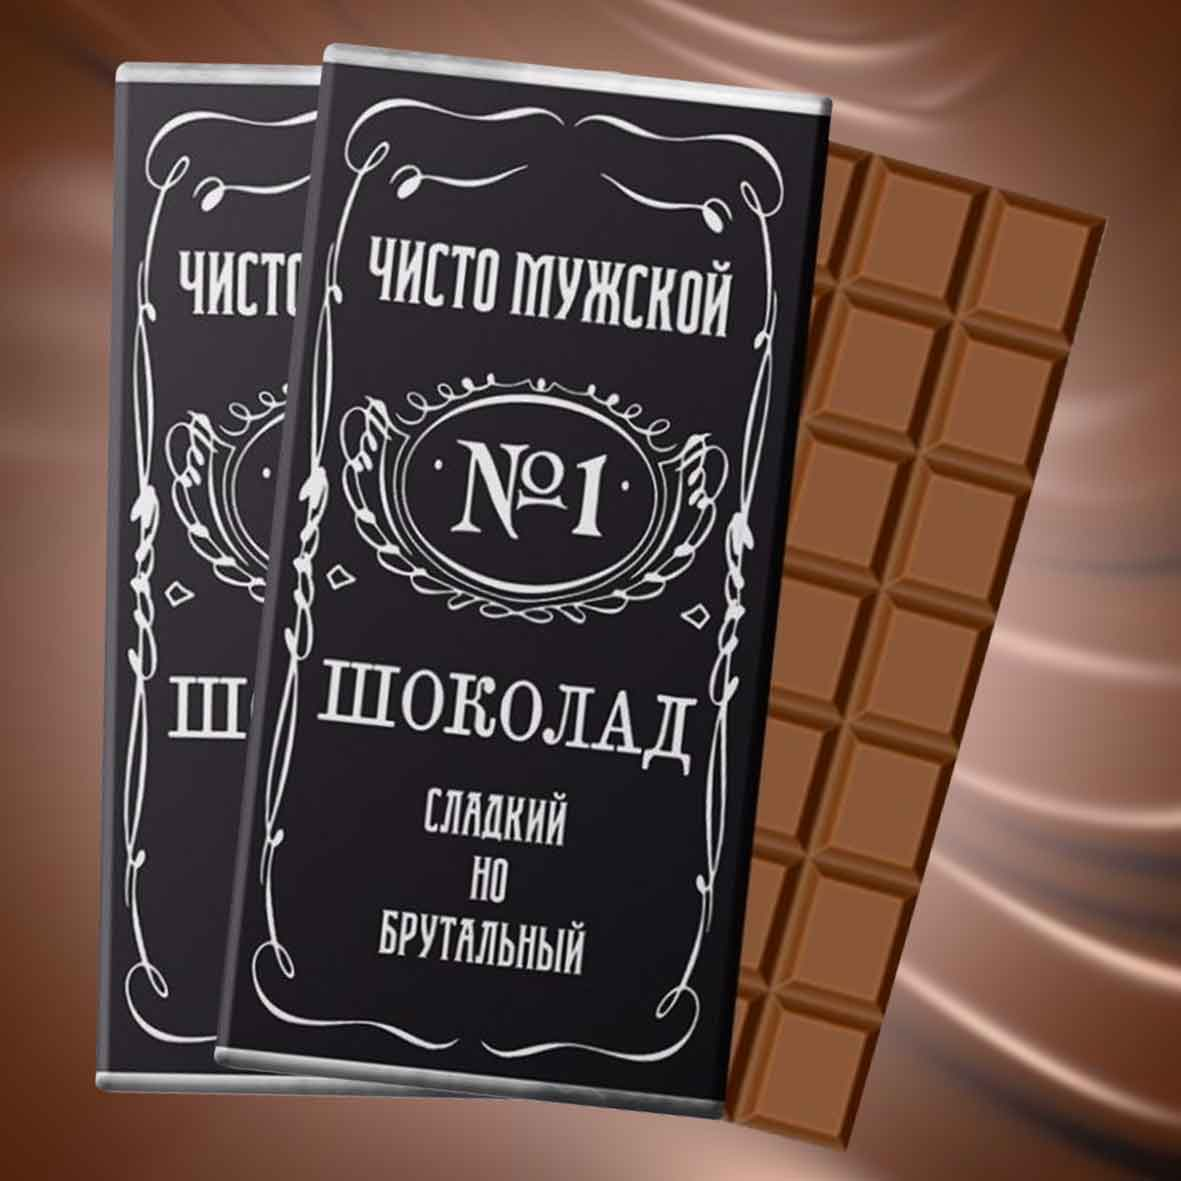 Красивая обертка шоколадки hand-made